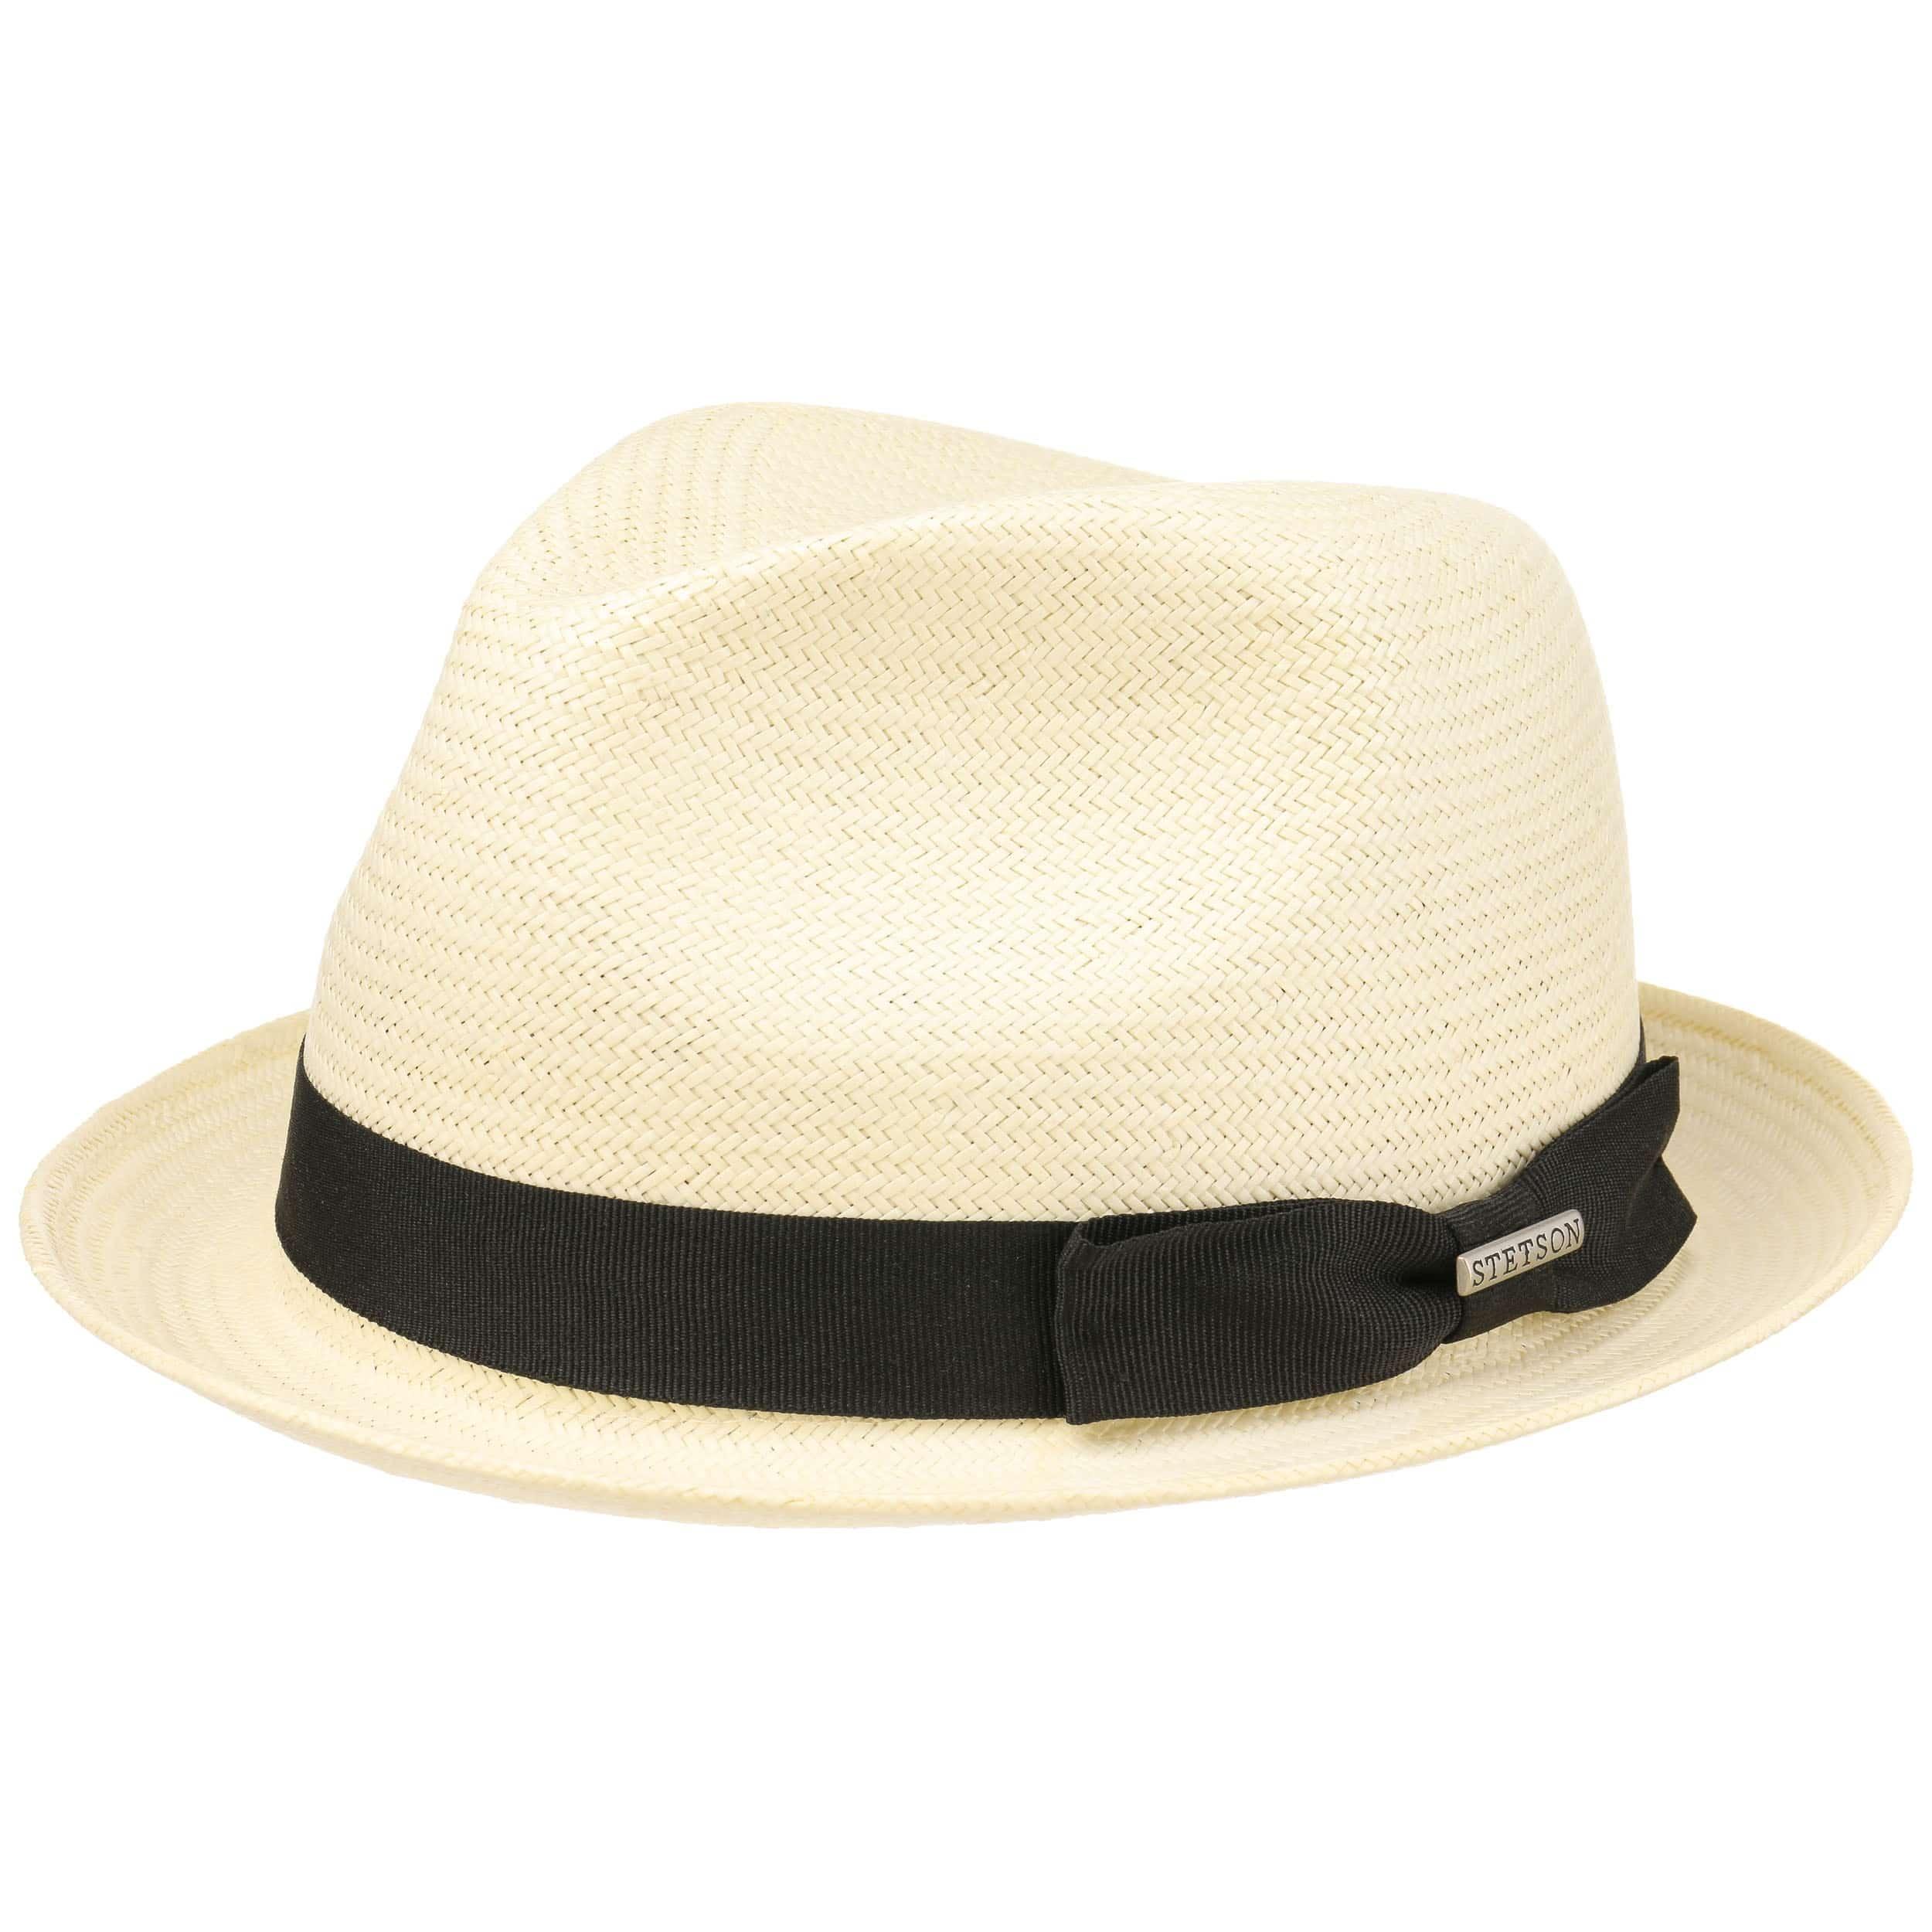 fa63d8b1aff Martinez Toyo Player Straw Hat by Stetson - 79,00 €